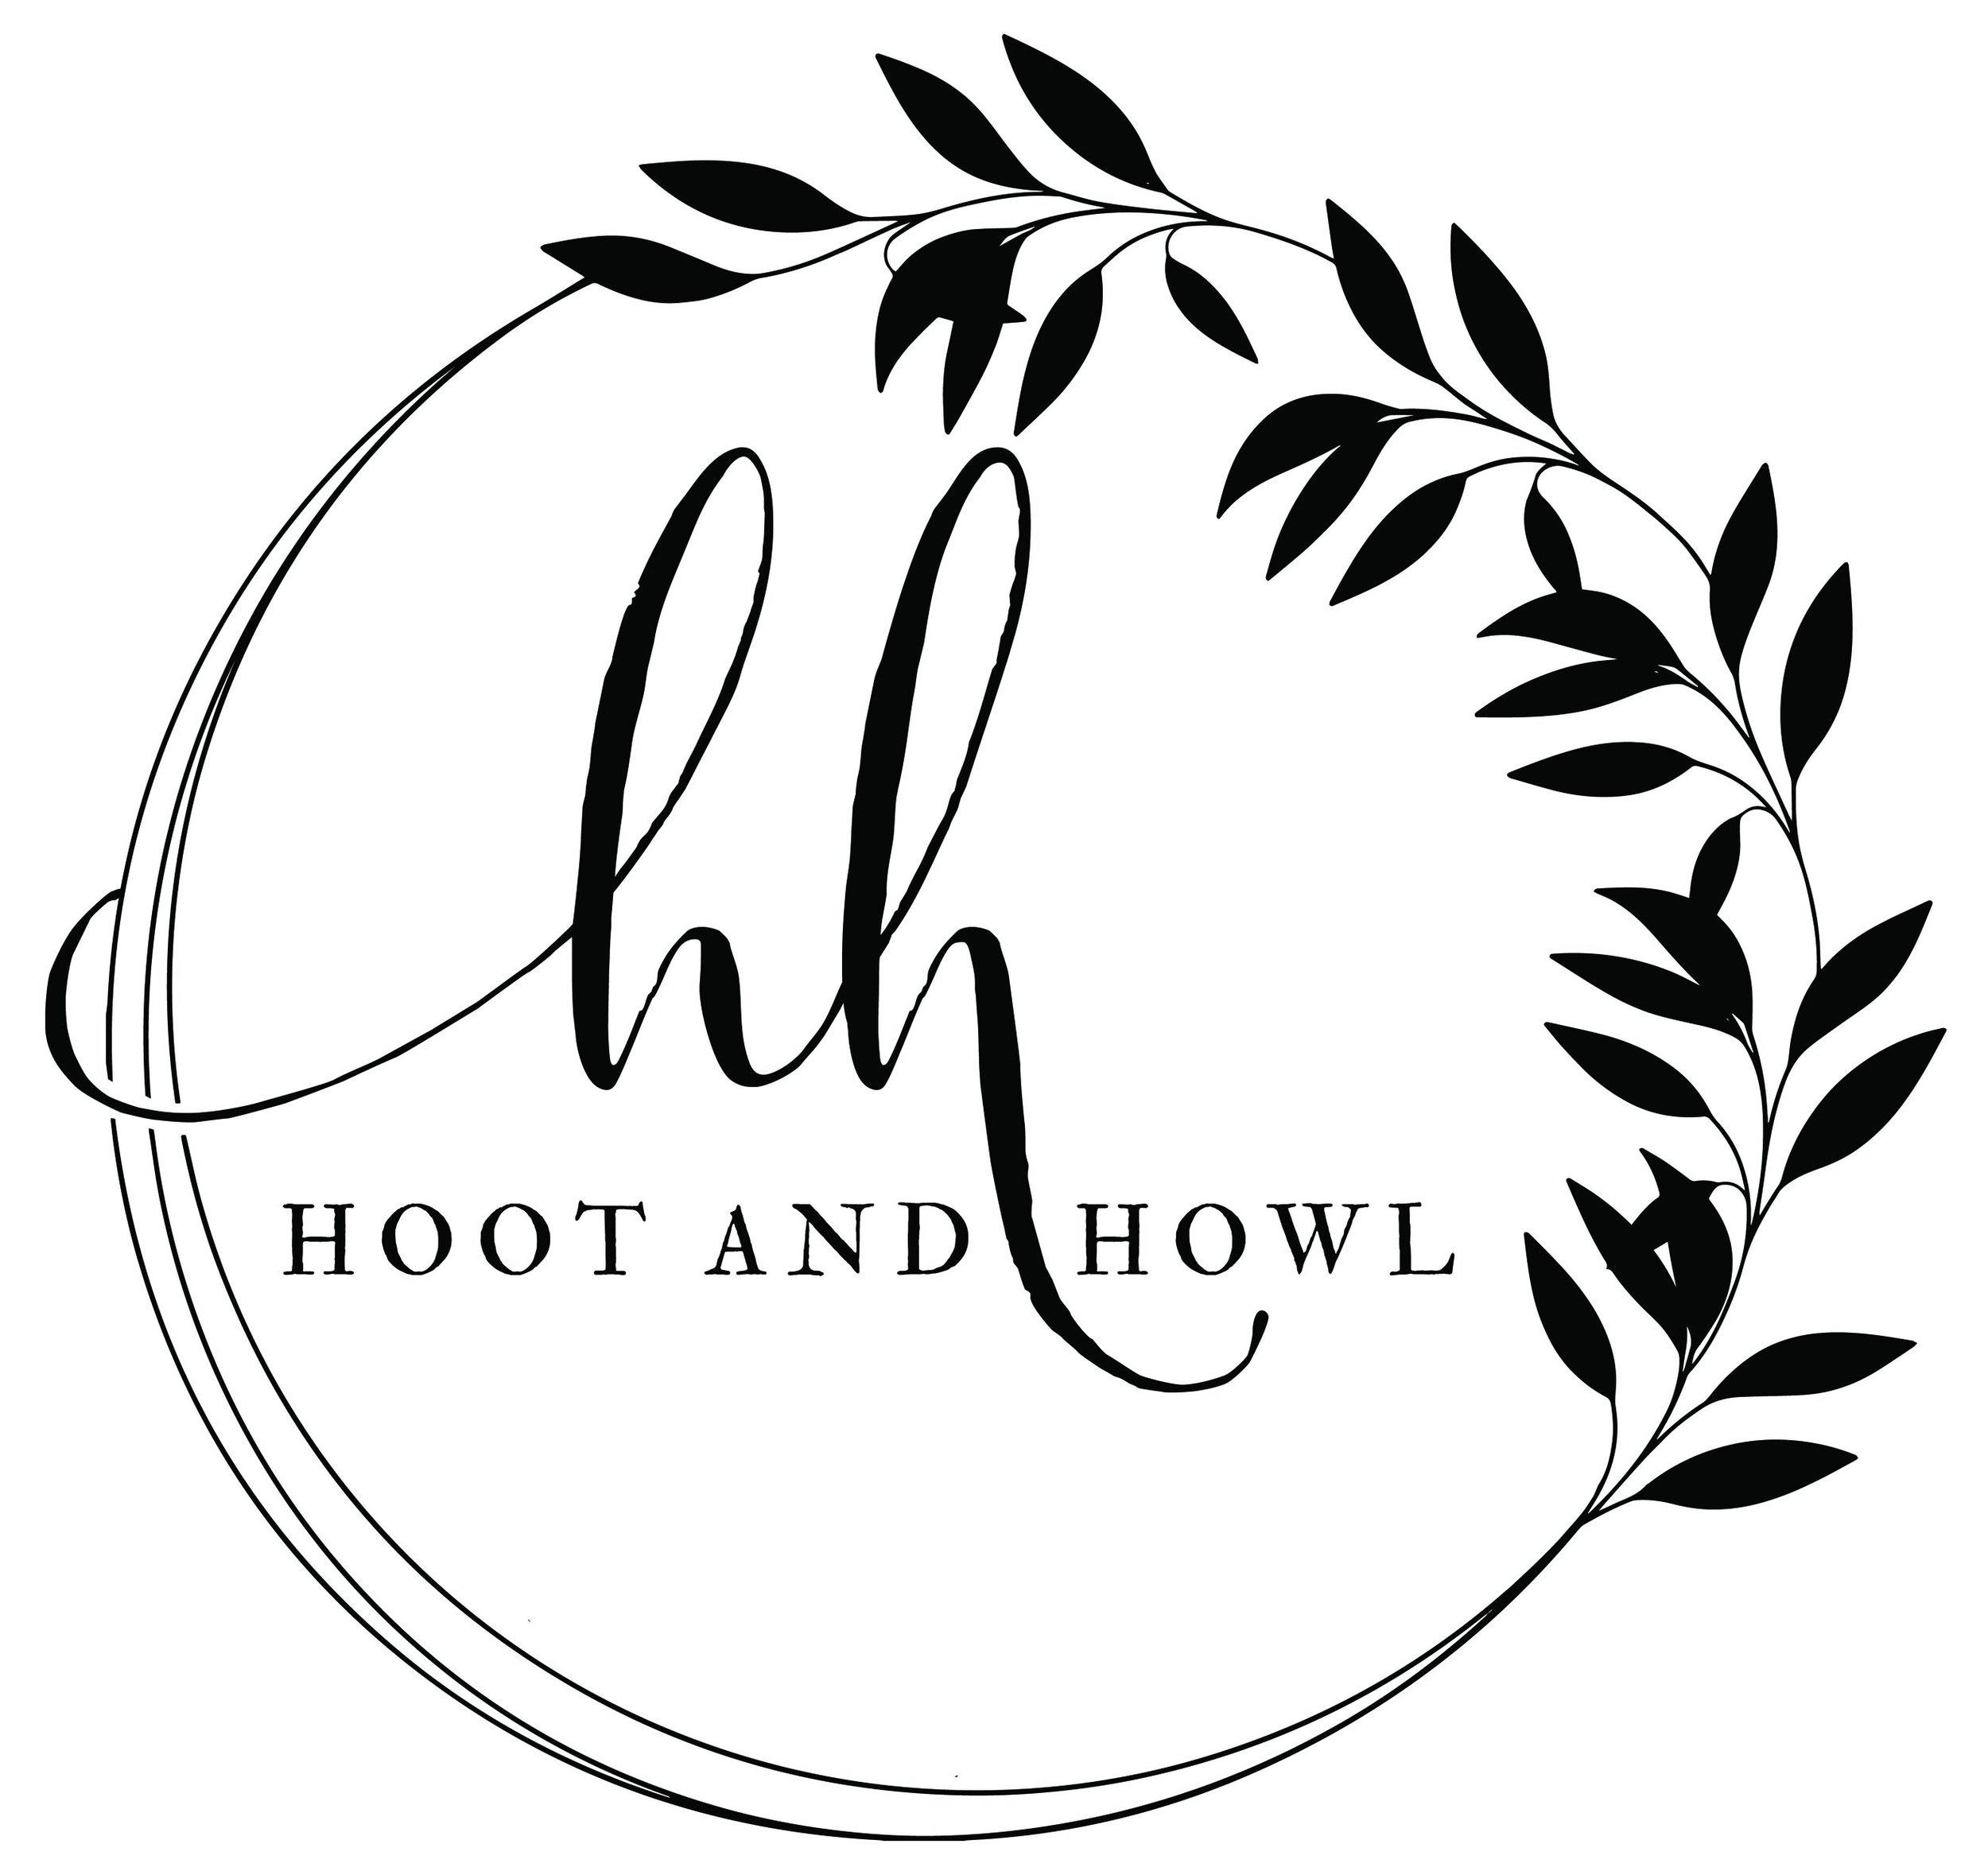 Hoot And Howl - 245 Walnut St, Morgantown, WV 26505(540) 533-0189